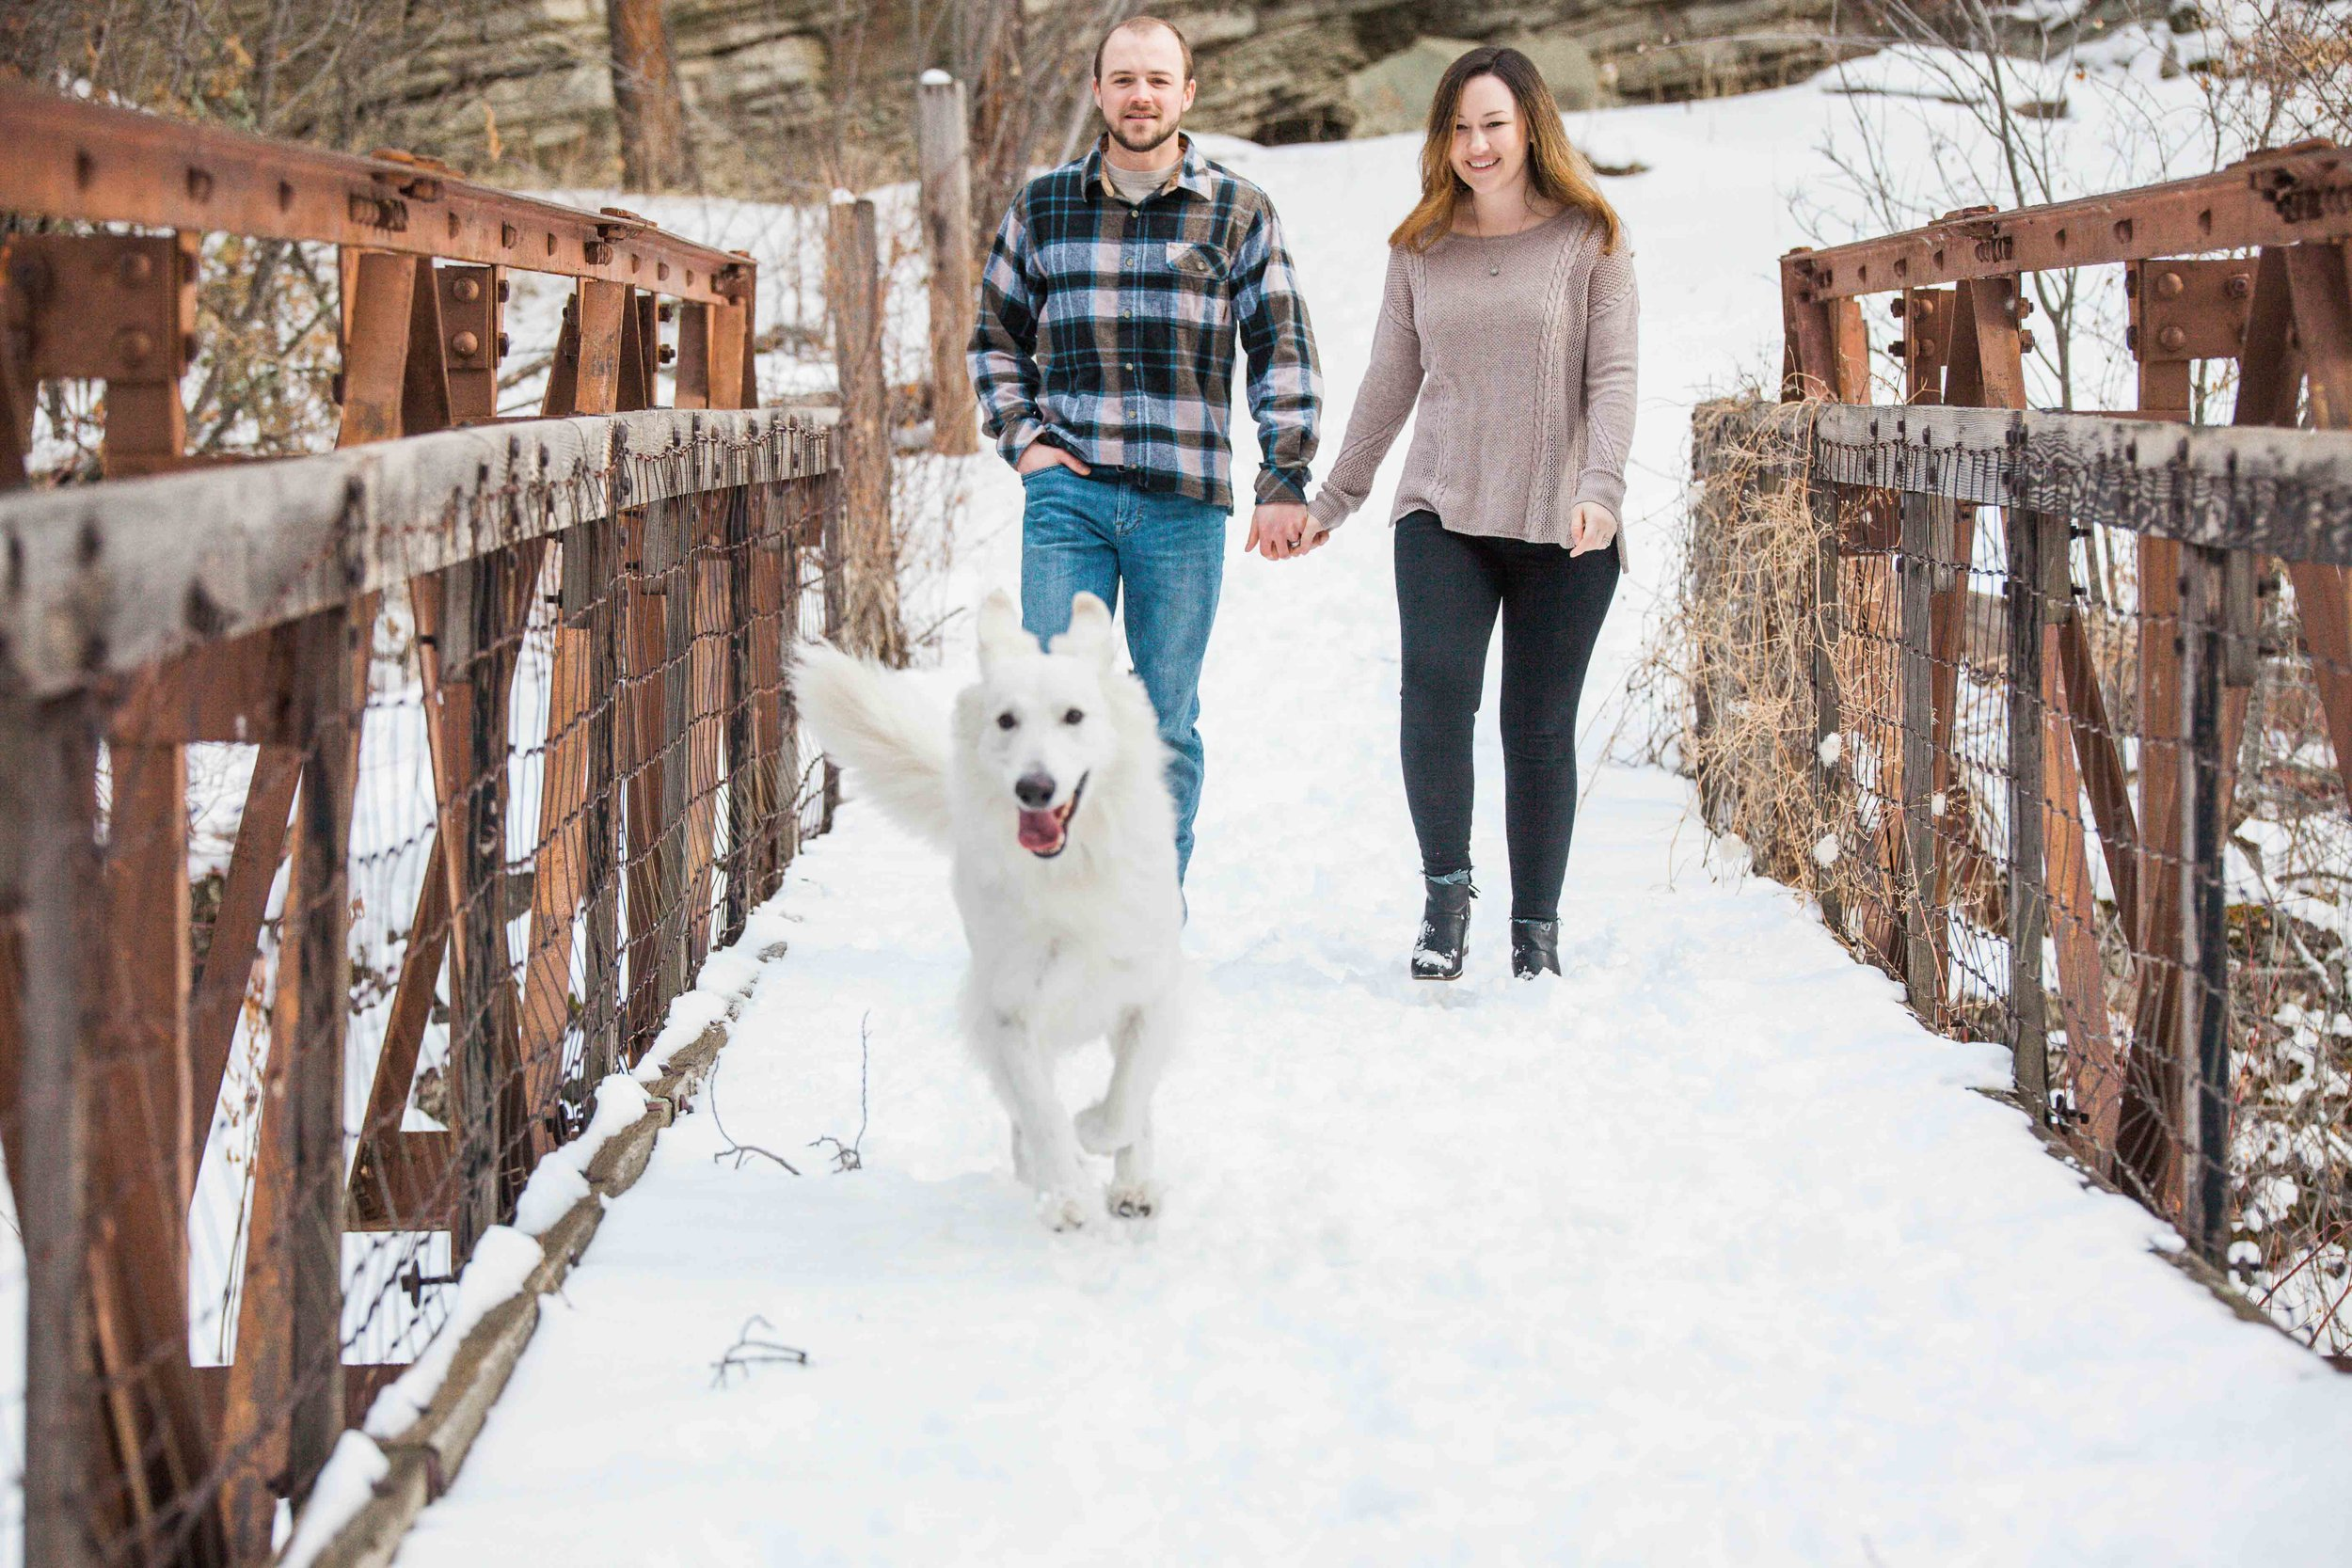 Kerns Photography - Sheridan Wyoming - Engagement Photos